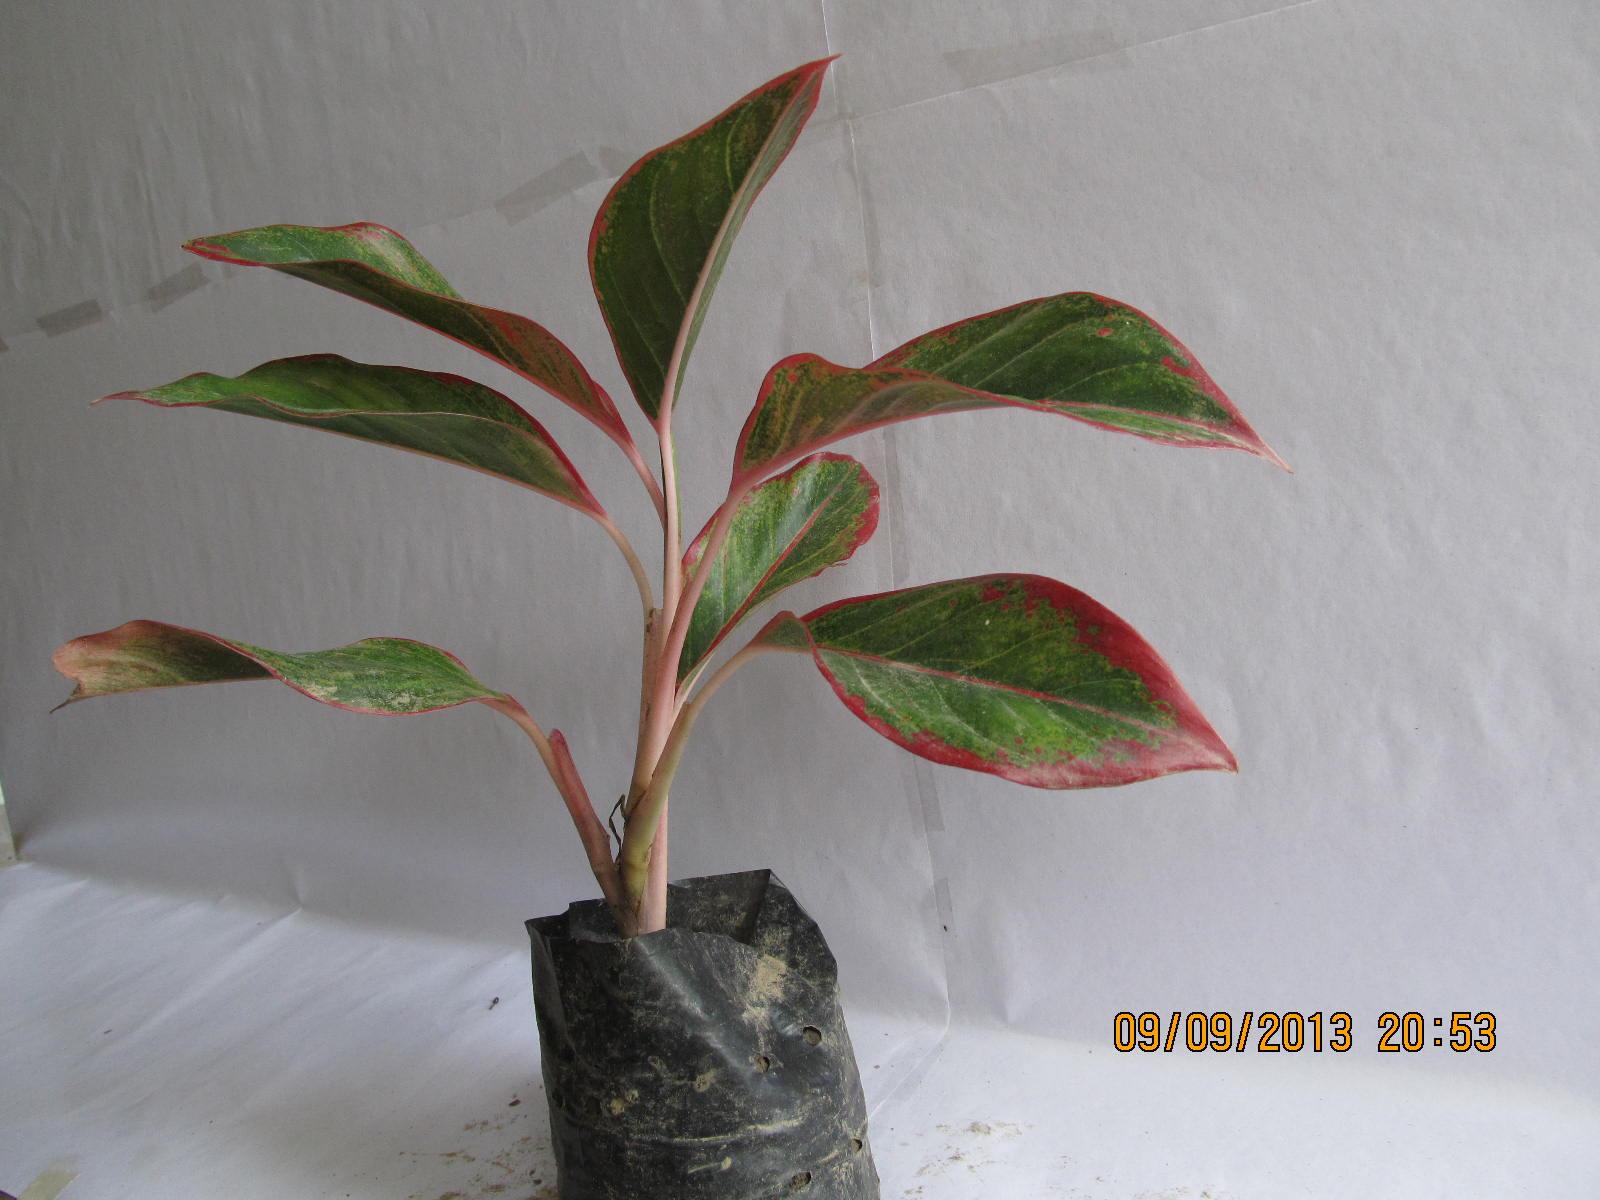 Red Aglaonema Show Plant